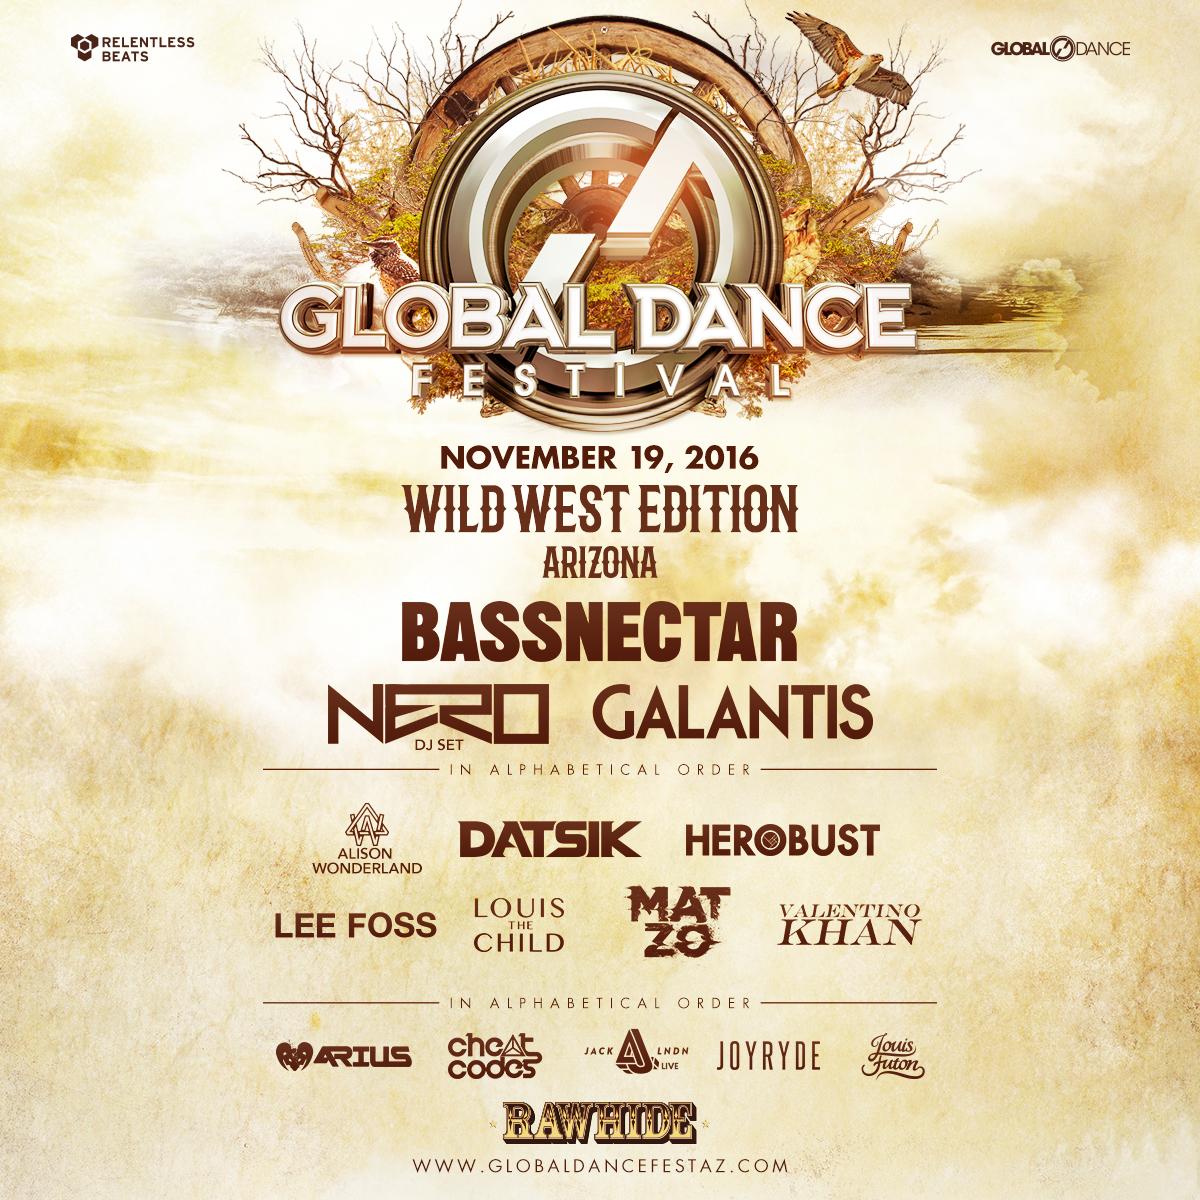 globaldancefestivalaz2016_lineupphase02_1200x1200